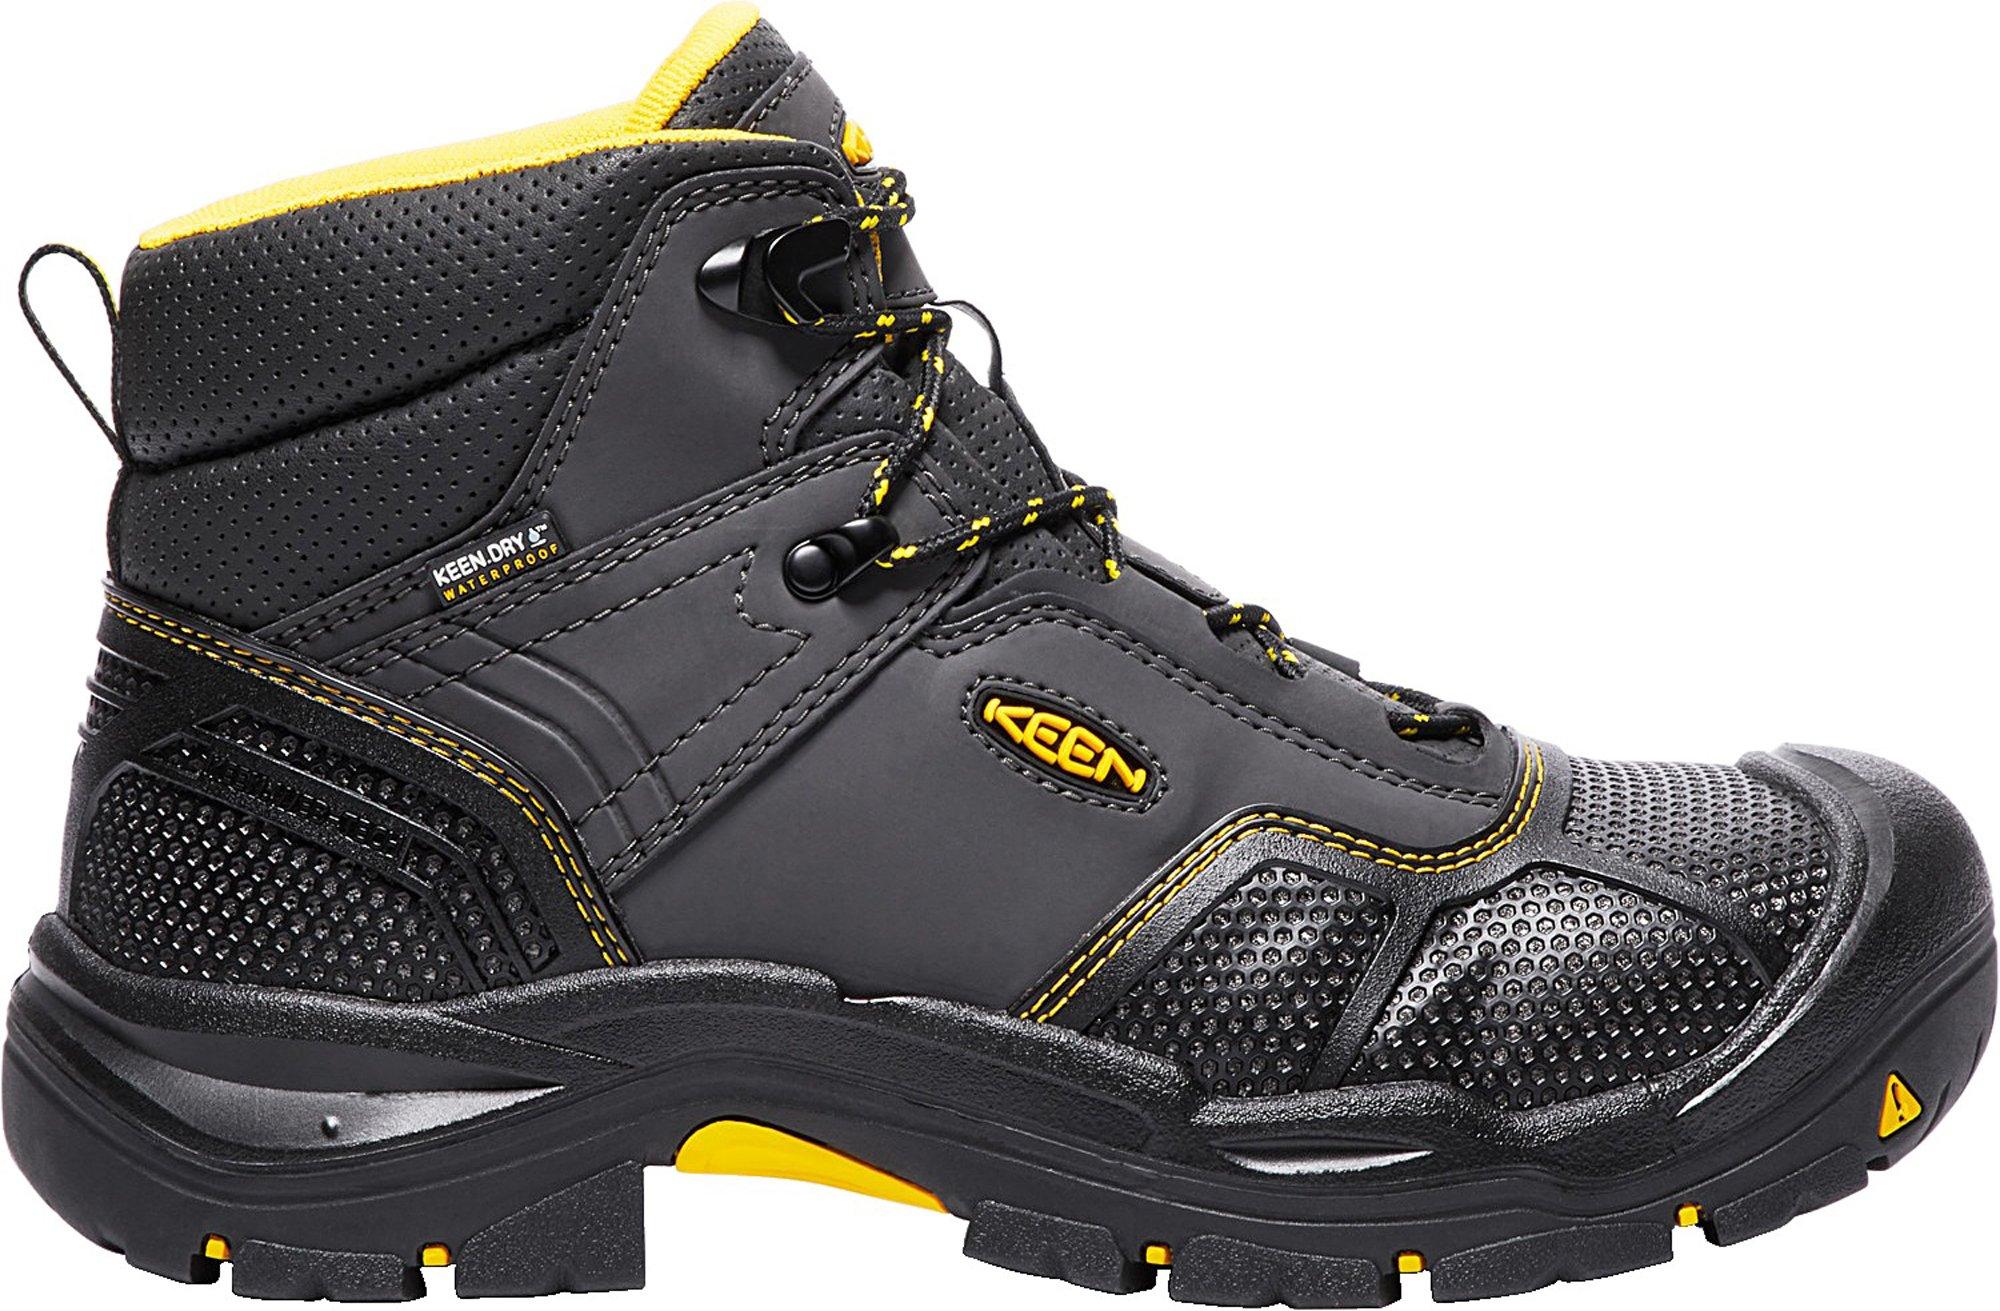 KEEN Utility Men's Logandale (Steel Toe) Waterproof Work Boot, Raven/Black, 15 D